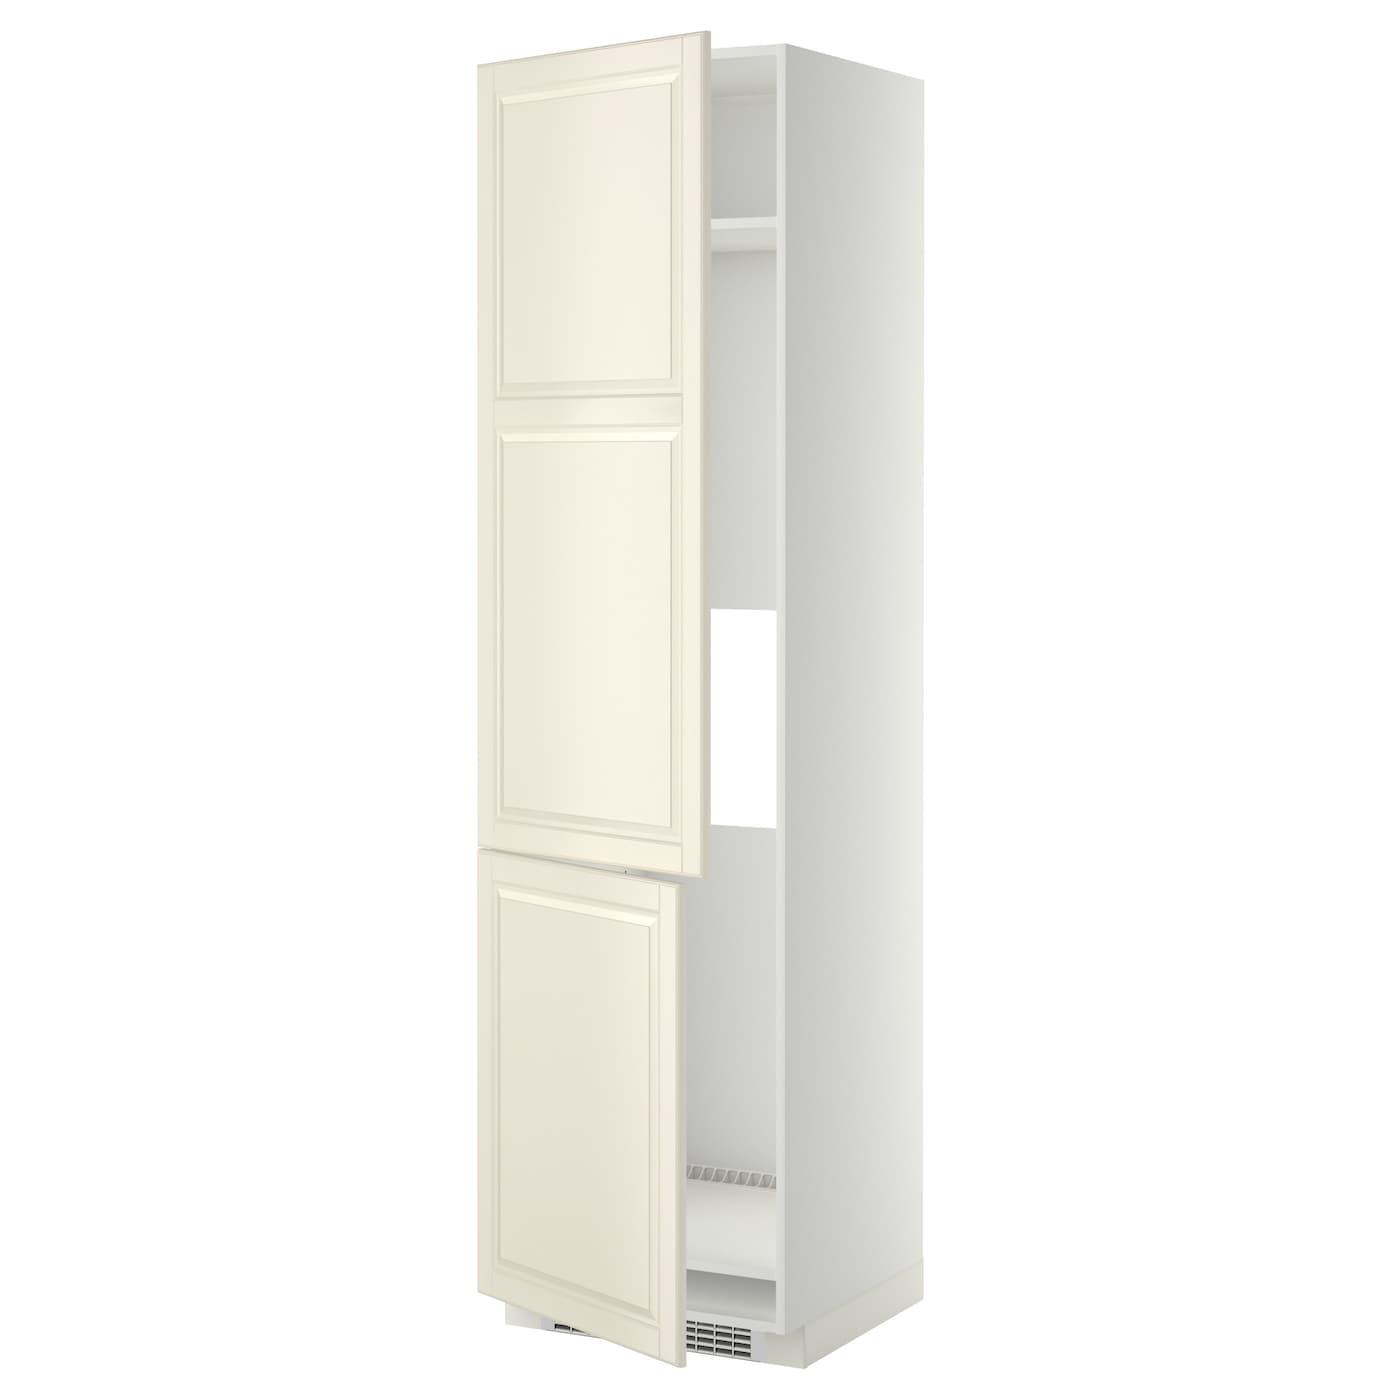 METOD High cab f fridge/freezer w 2 doors White/bodbyn off-white ...